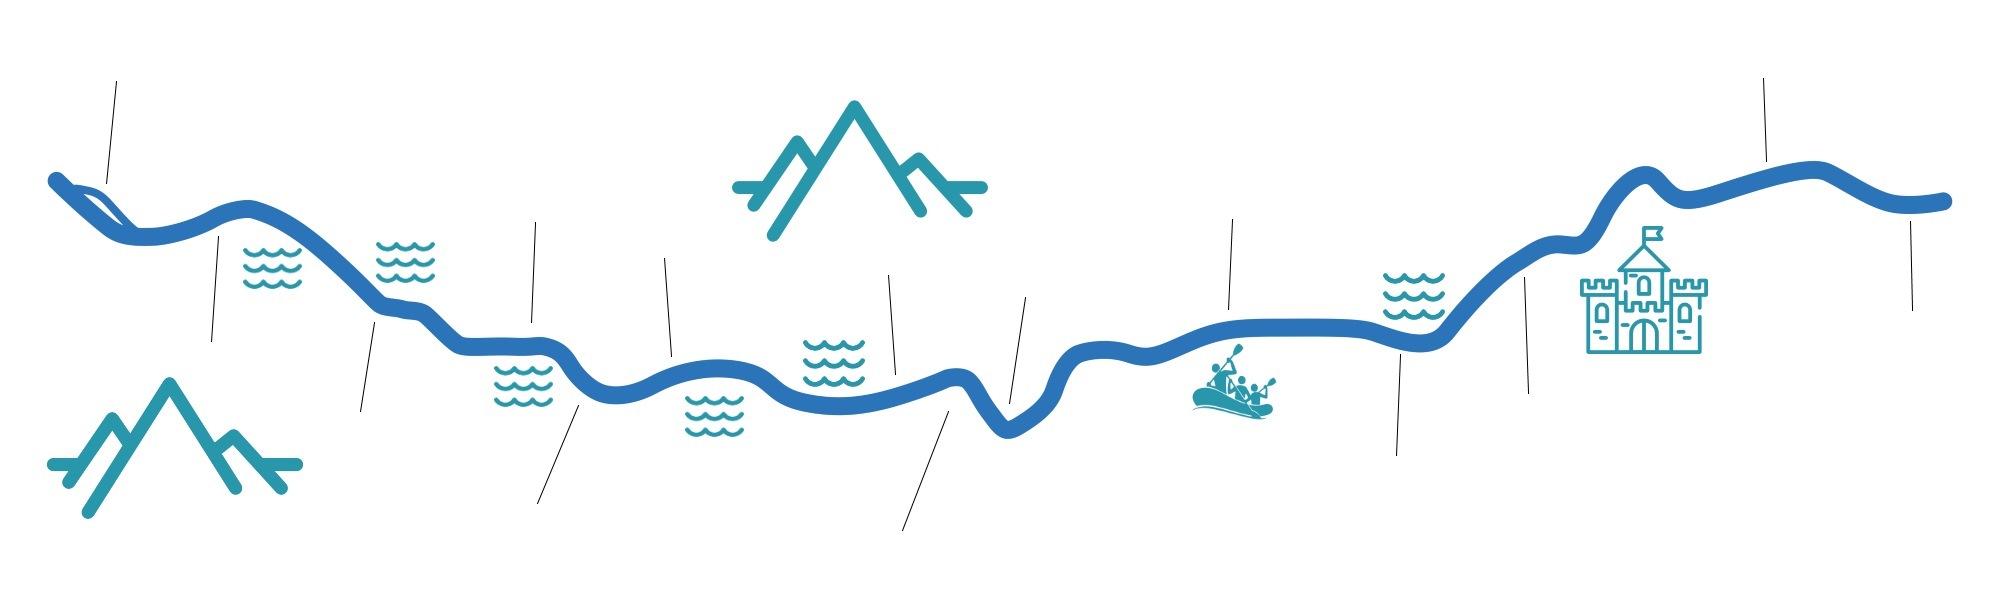 Flussplan Funrafting Salzach